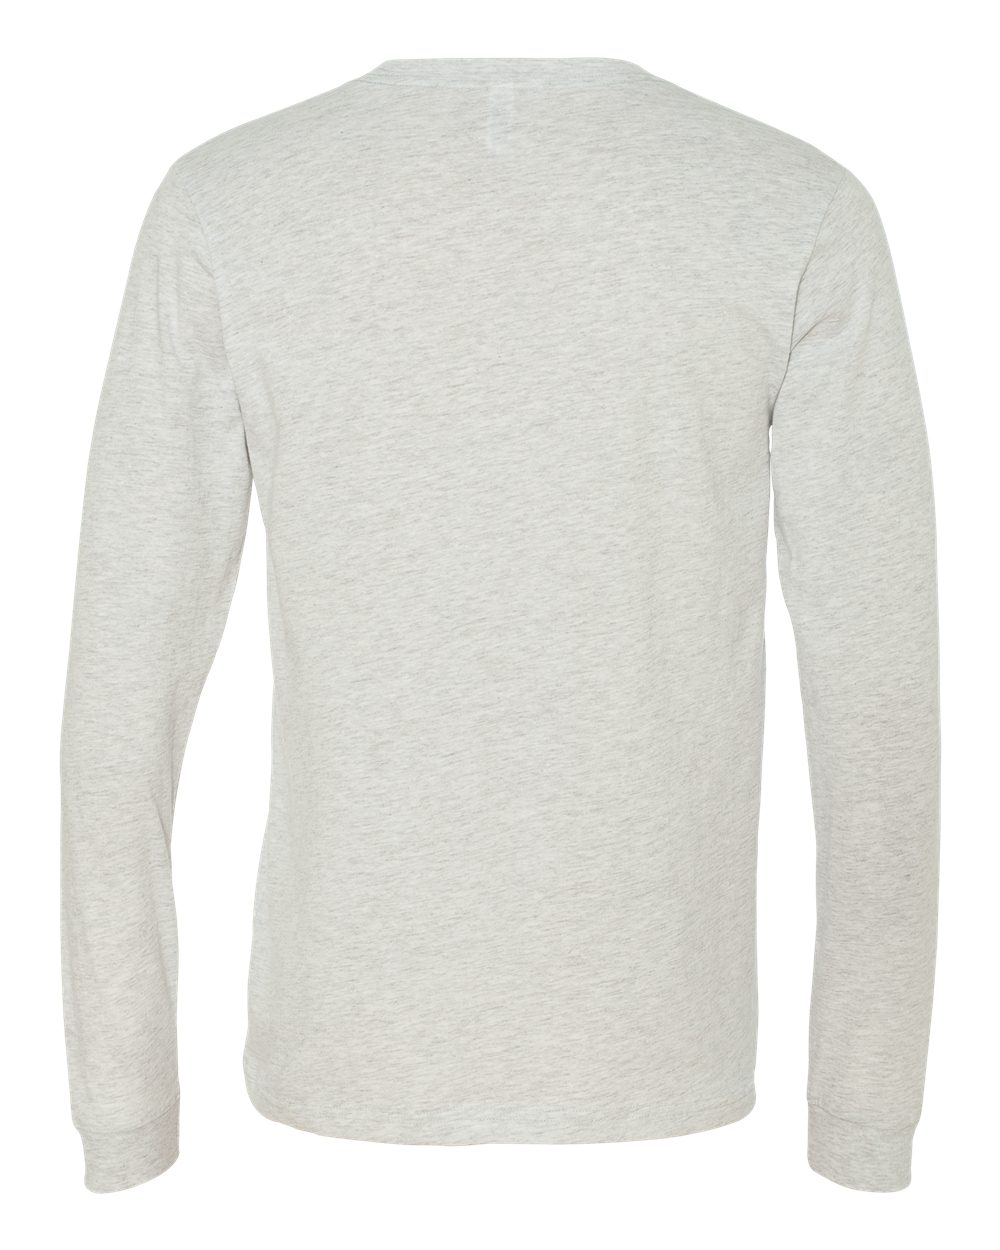 Bella-Canvas-Mens-Blank-Top-Long-Sleeve-Jersey-Tee-T-Shirt-3501-up-to-3XL thumbnail 7